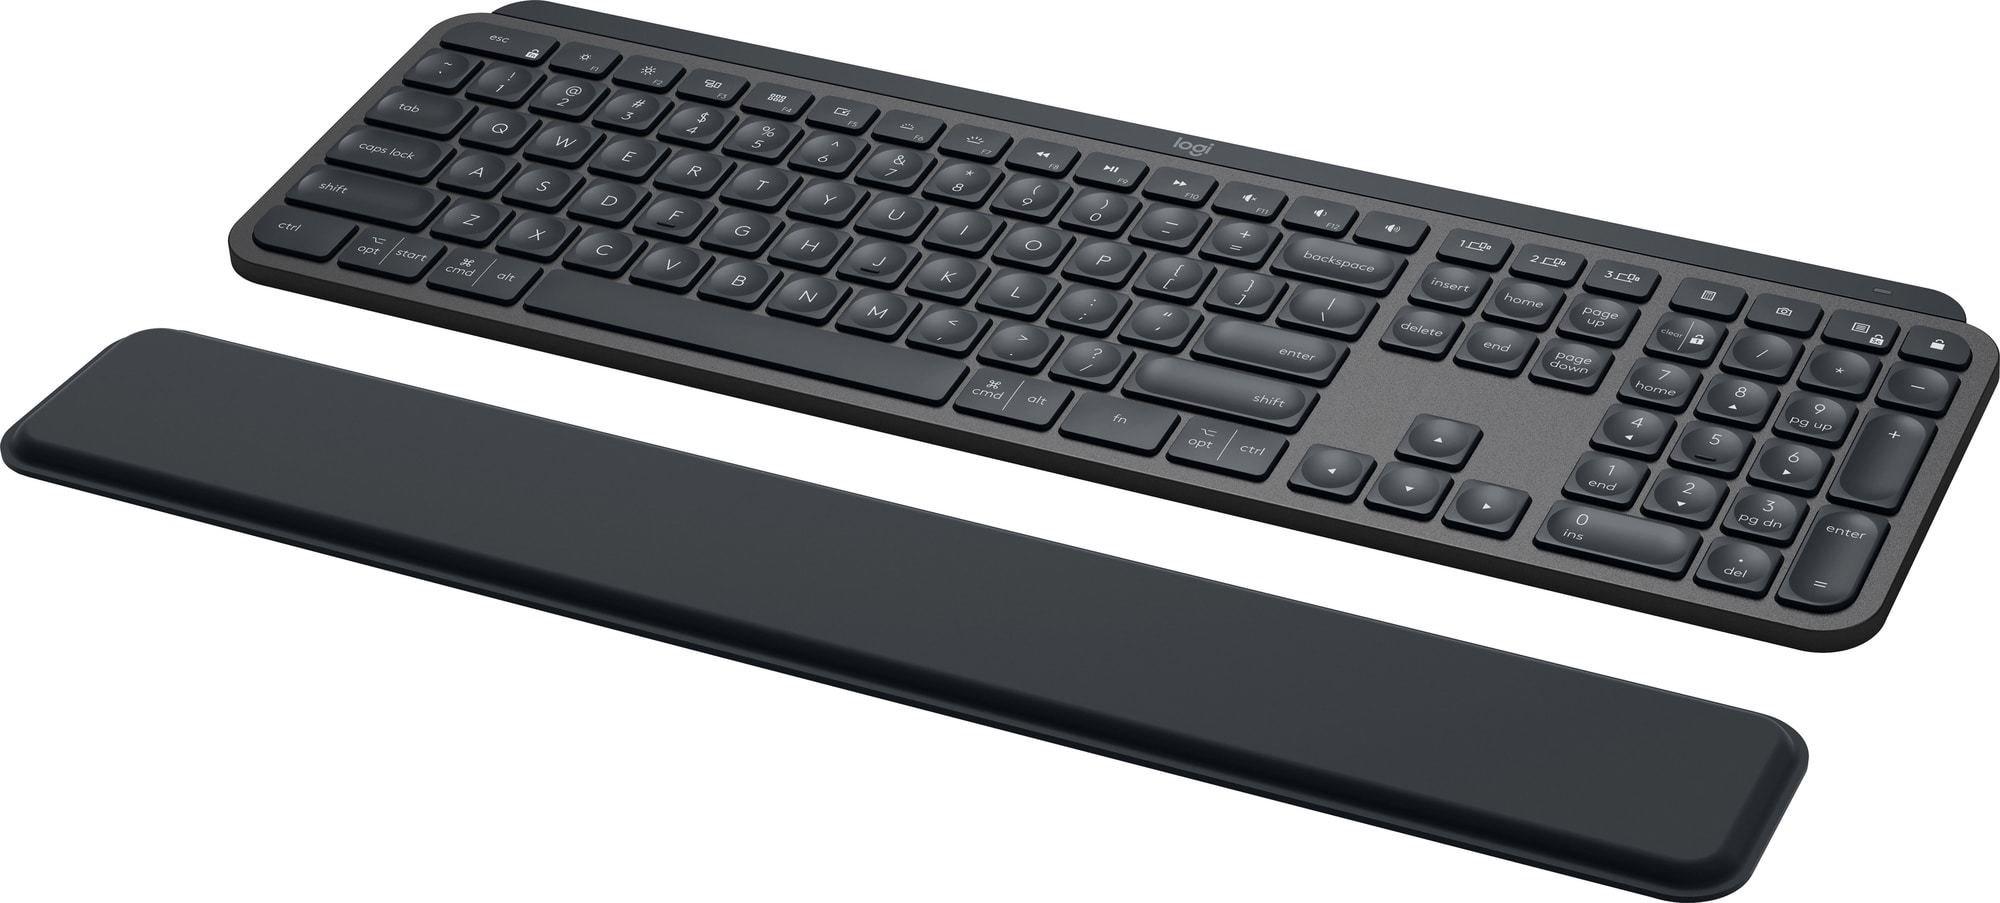 Best pris på Apple Magic Keyboard (ES) Tastatur Sammenlign